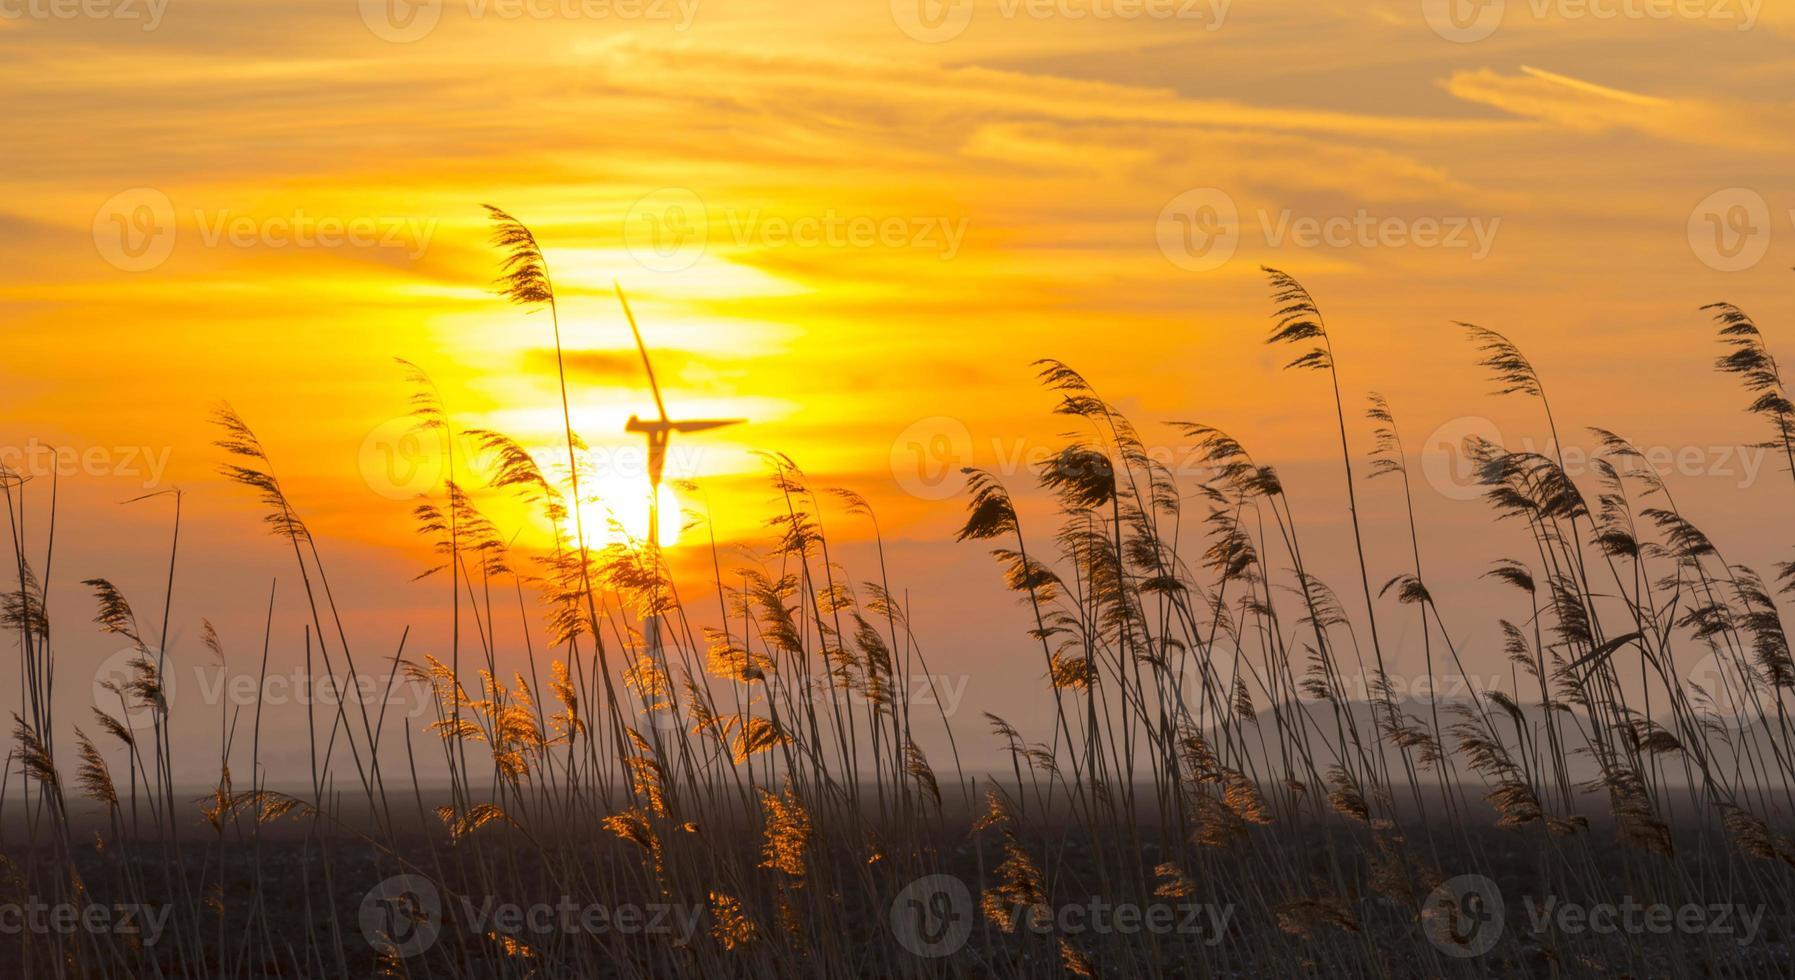 zonsopgang boven reed in een veld in de winter foto